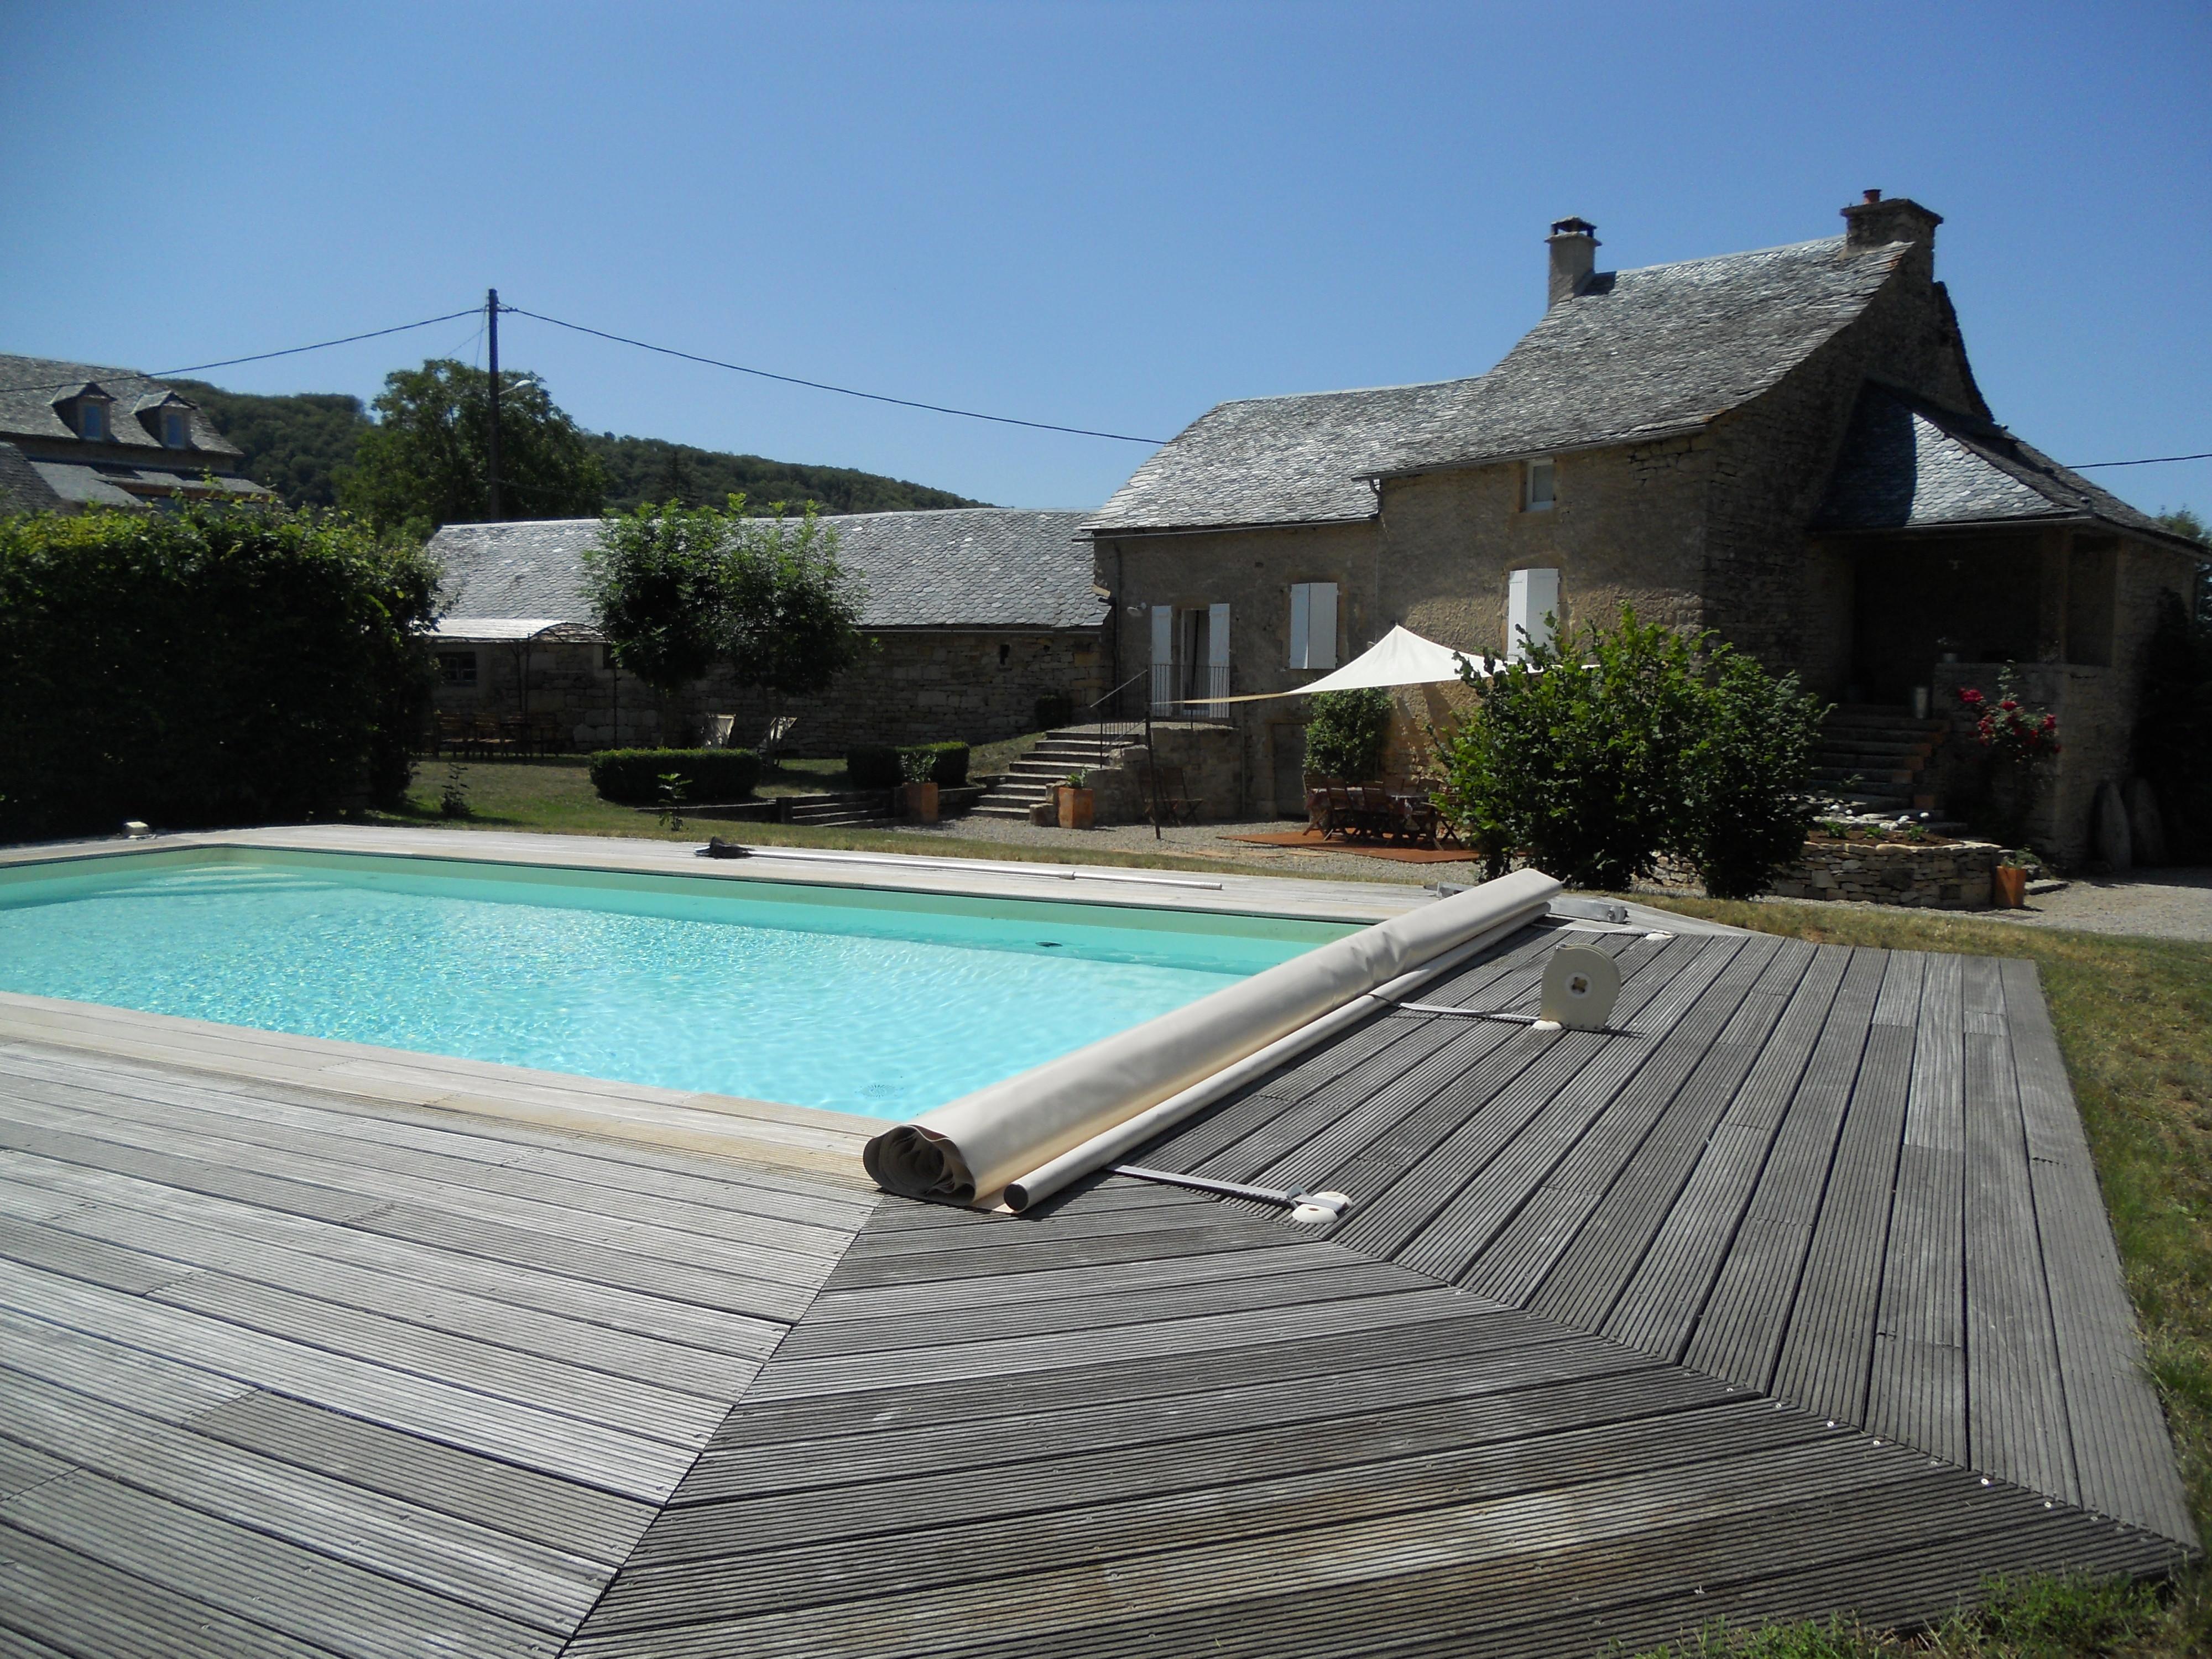 location maison avec piscine aubrac ventana blog. Black Bedroom Furniture Sets. Home Design Ideas